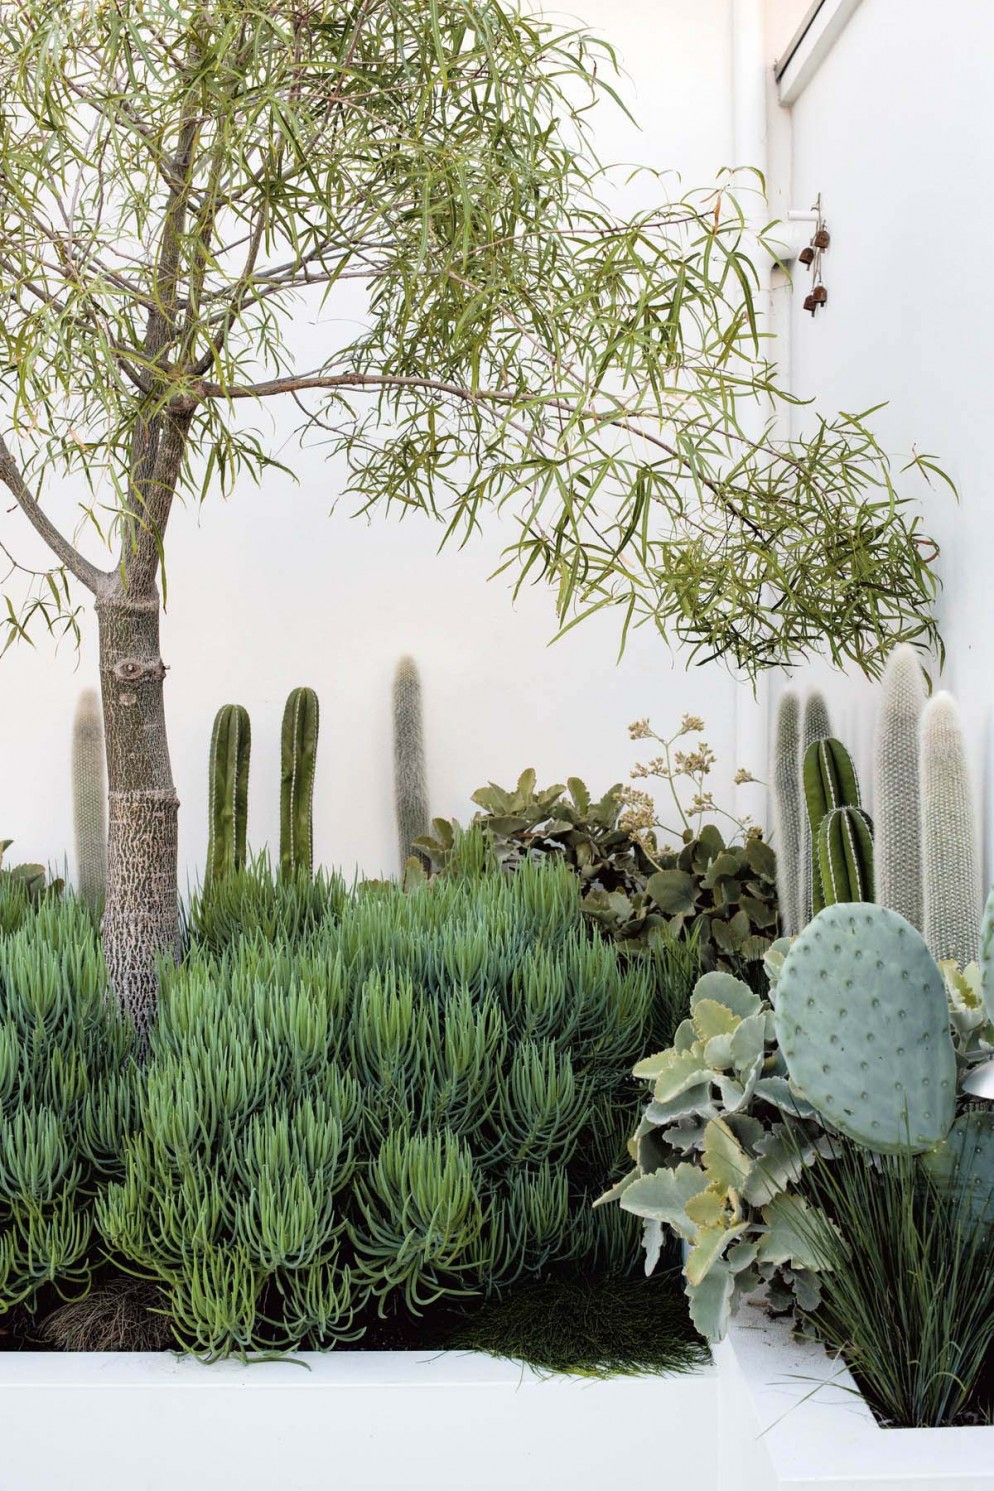 piante-giardini-verde-idee-01